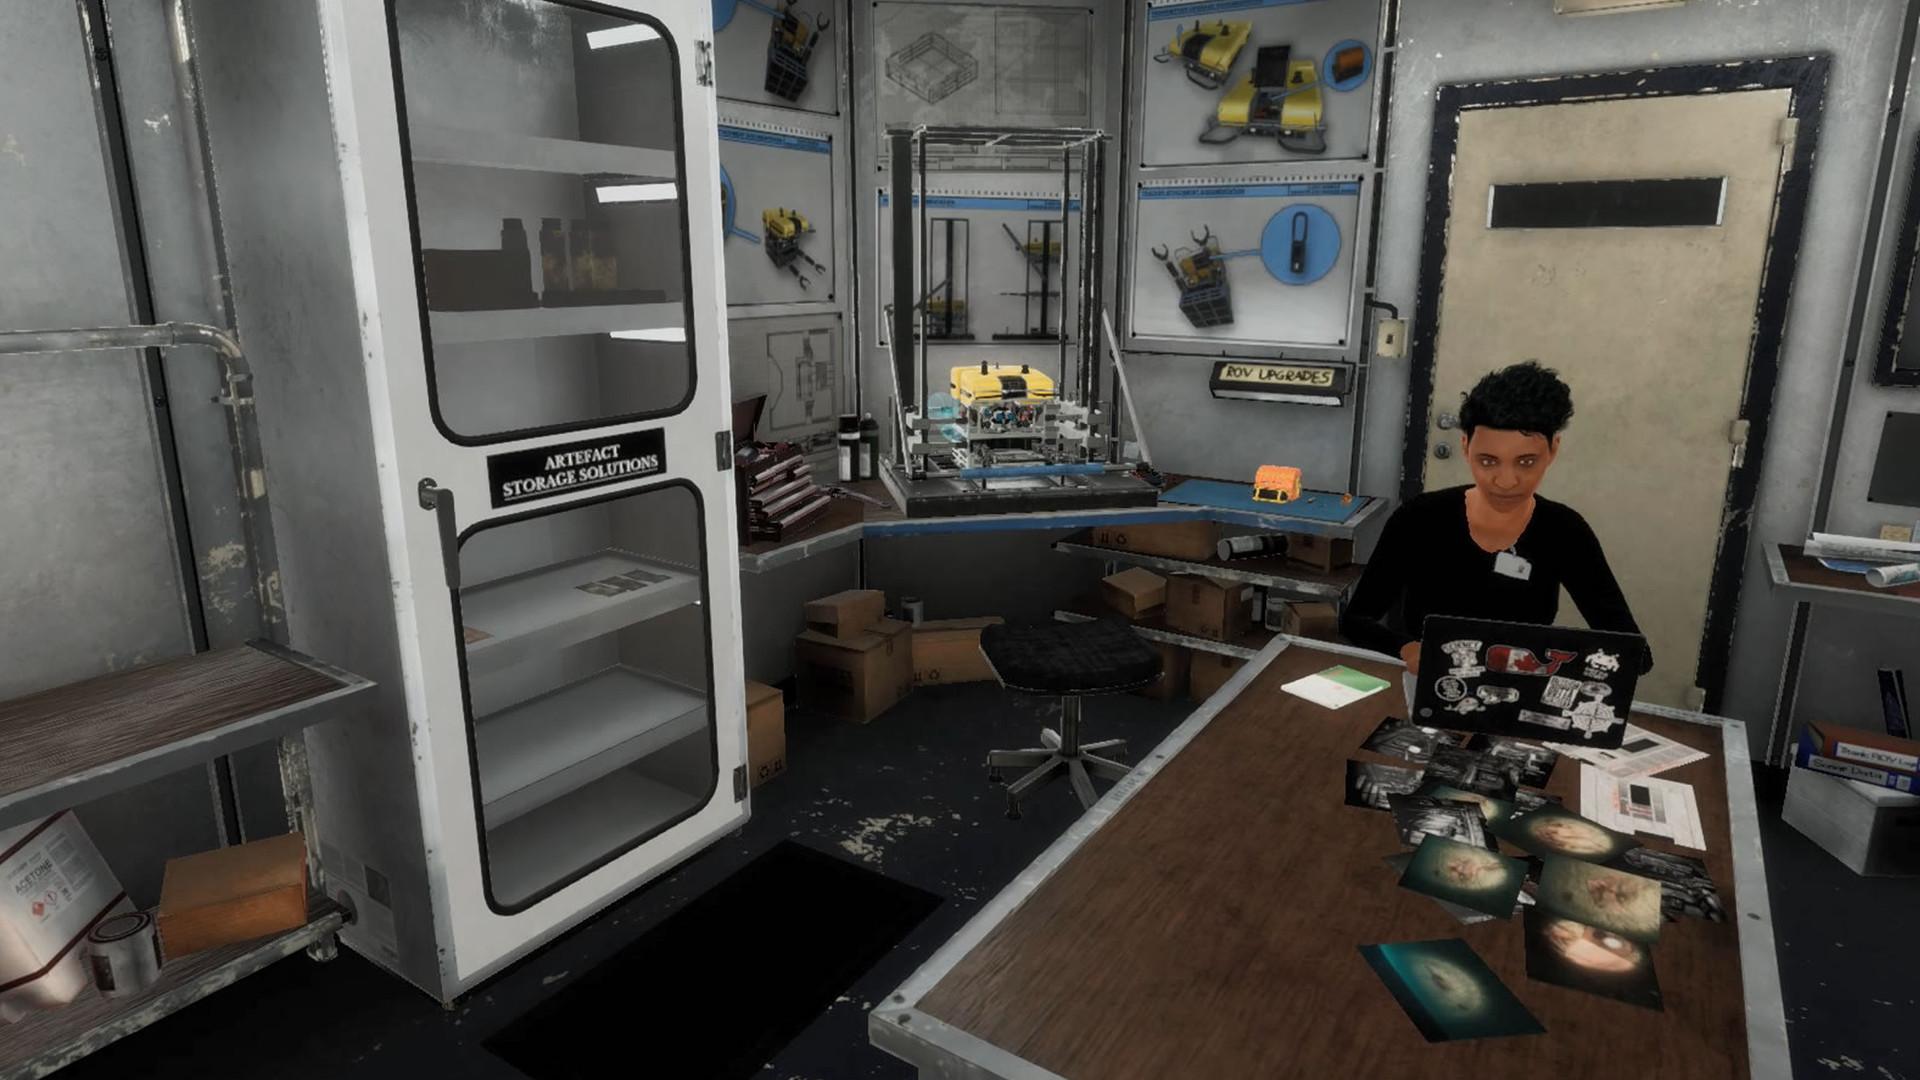 Titanic-VR-SteamVR-Oculus-Rift-HTC-Vive